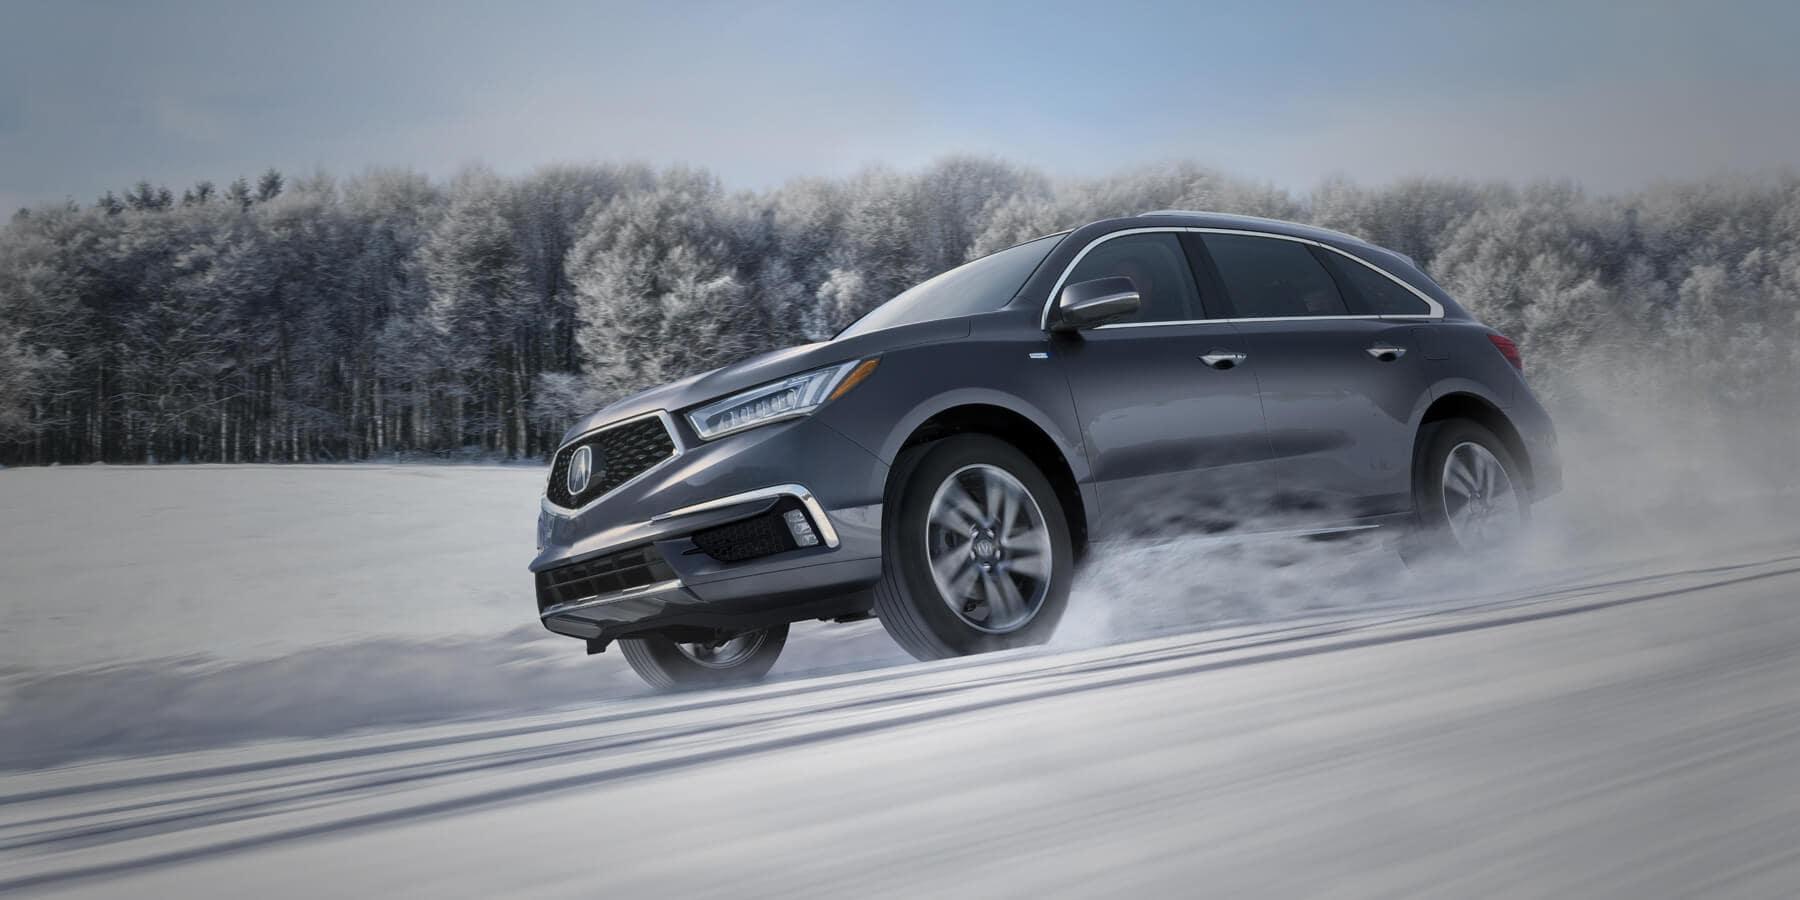 2019 Acura MDX Modern Steel Metallic Front Angle Snow HP Slide